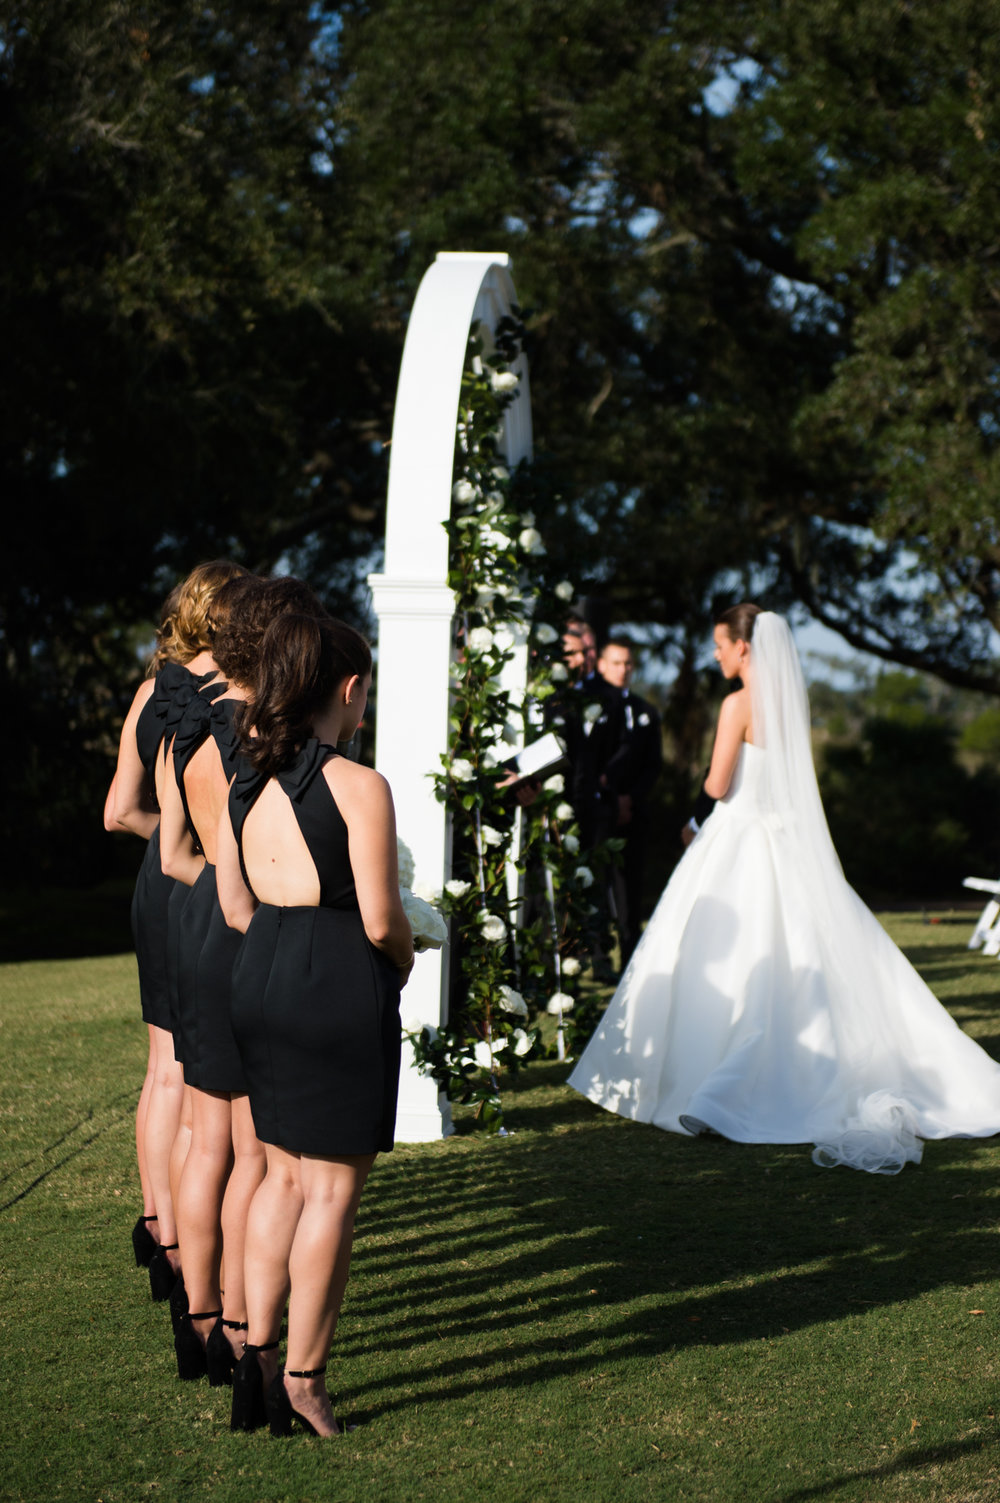 Bridesmaids dresses at Kiawah Island Wedding Ceremony